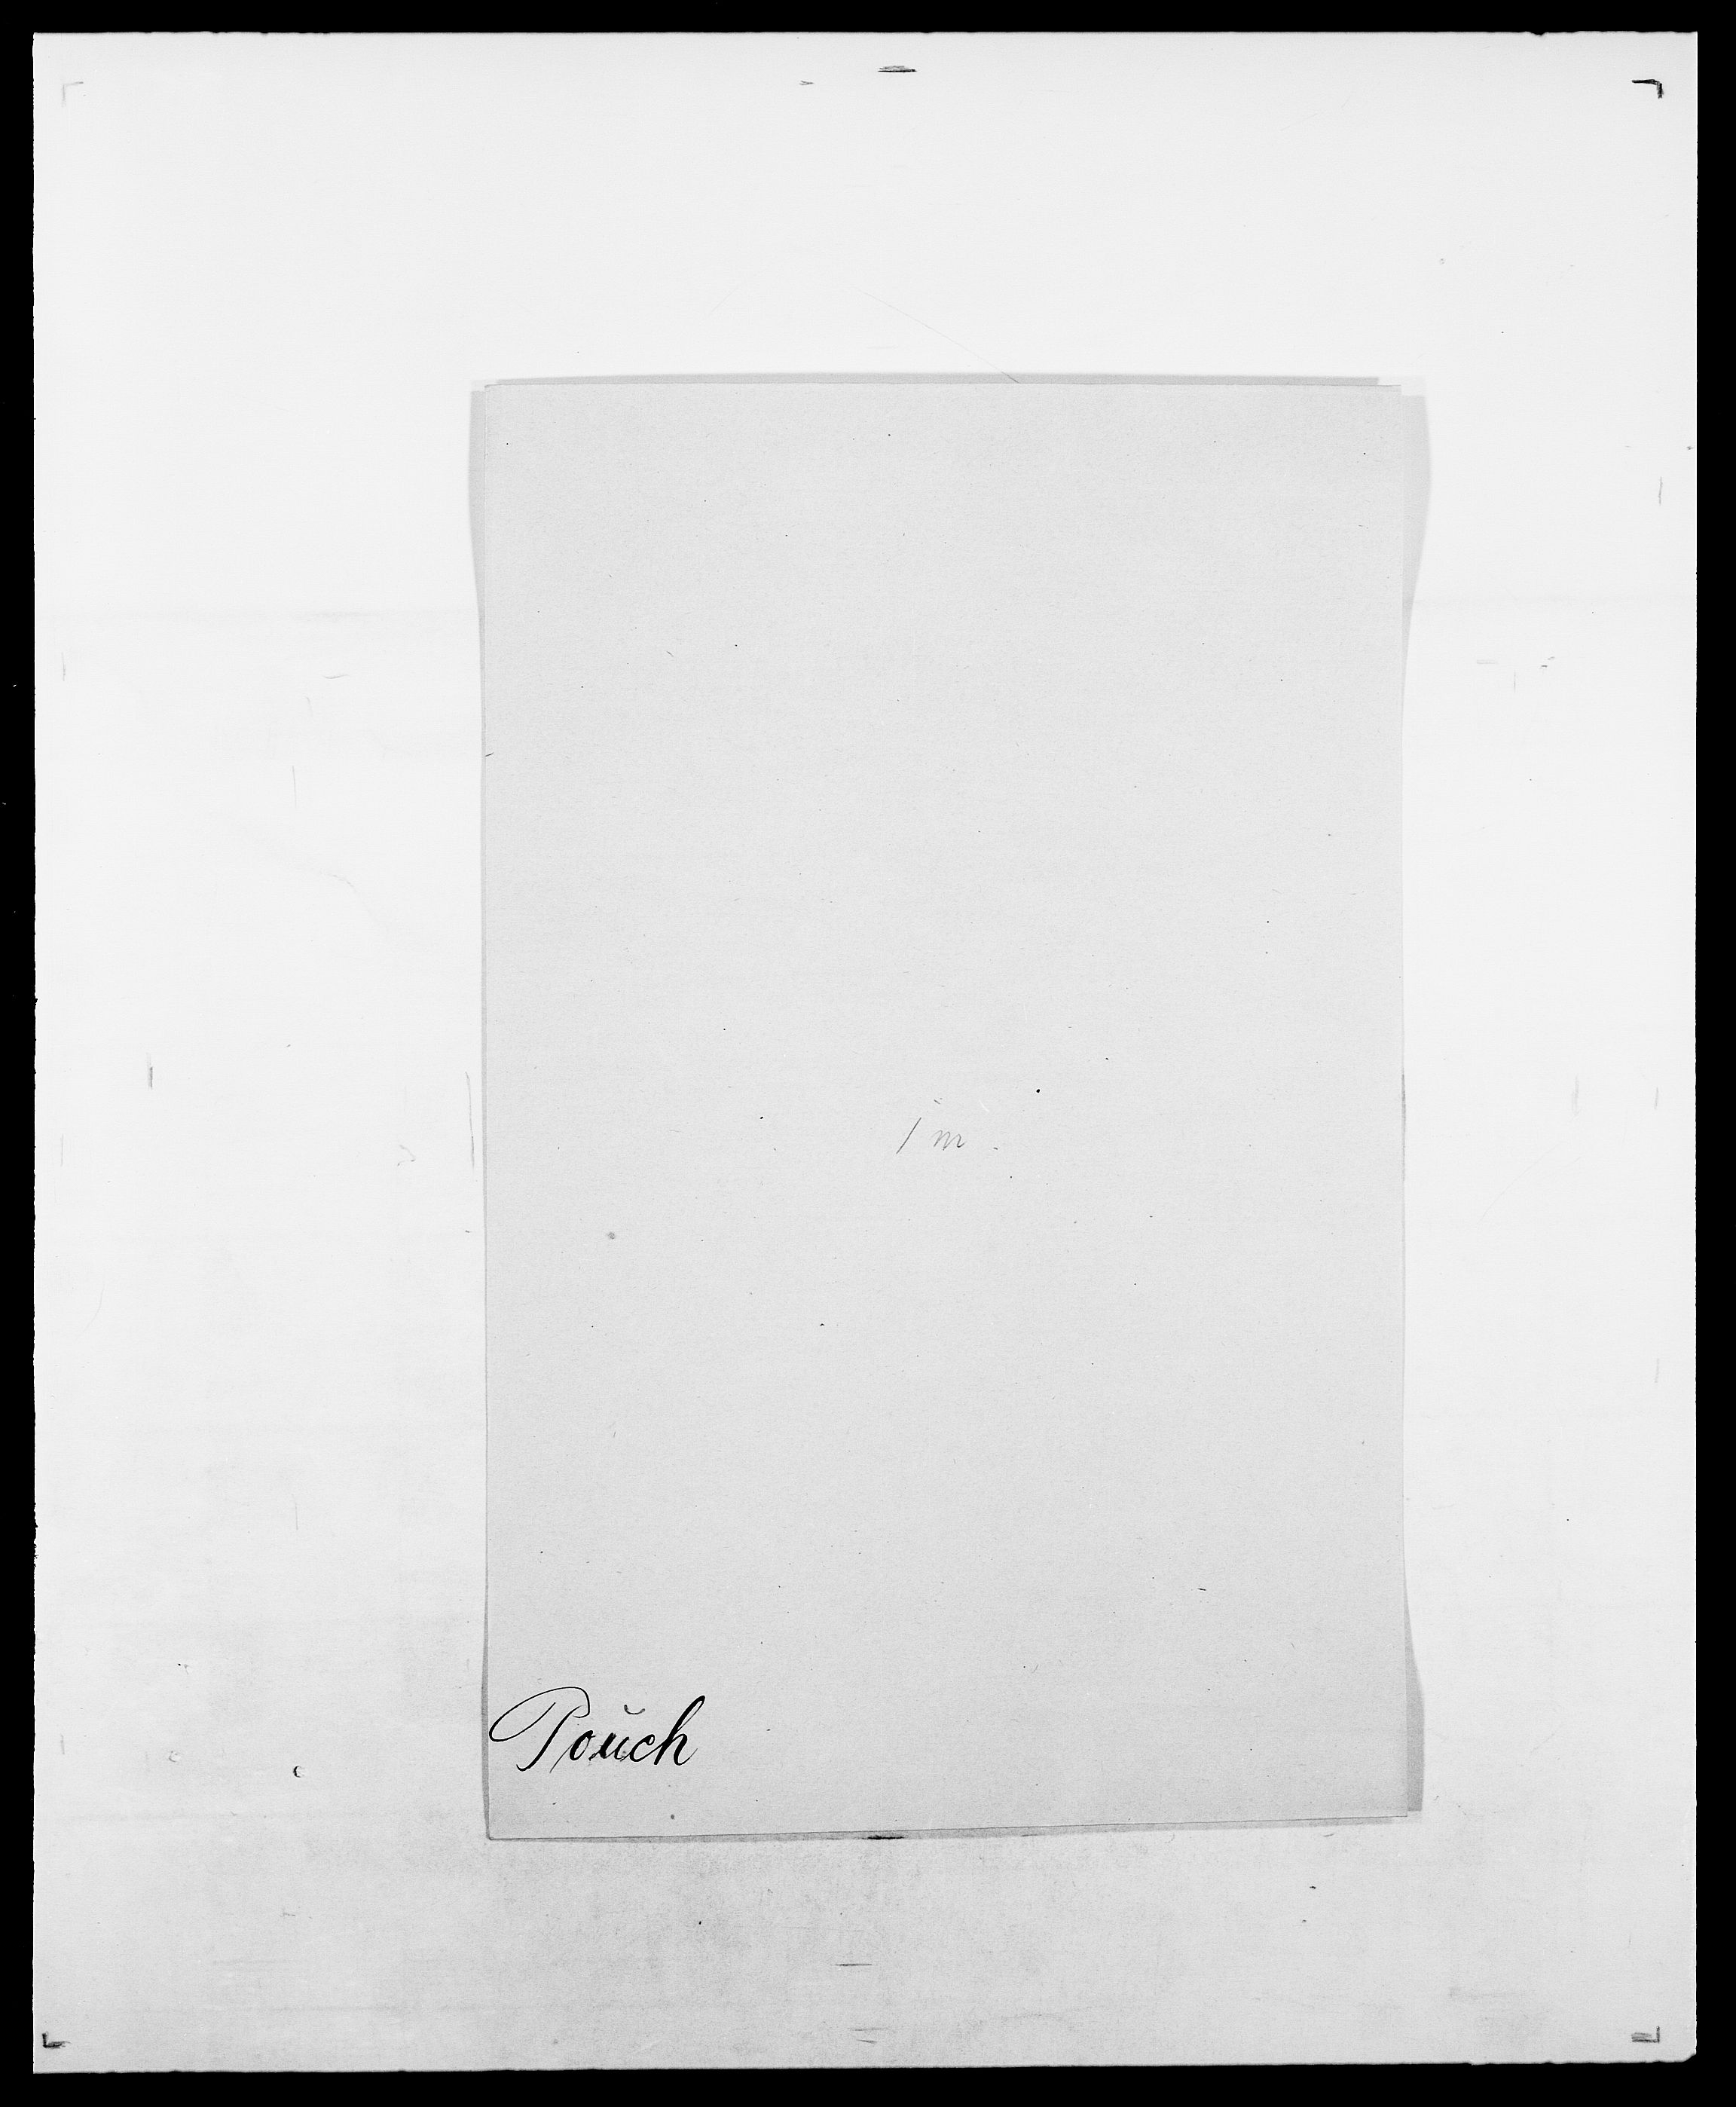 SAO, Delgobe, Charles Antoine - samling, D/Da/L0031: de Place - Raaum, s. 263